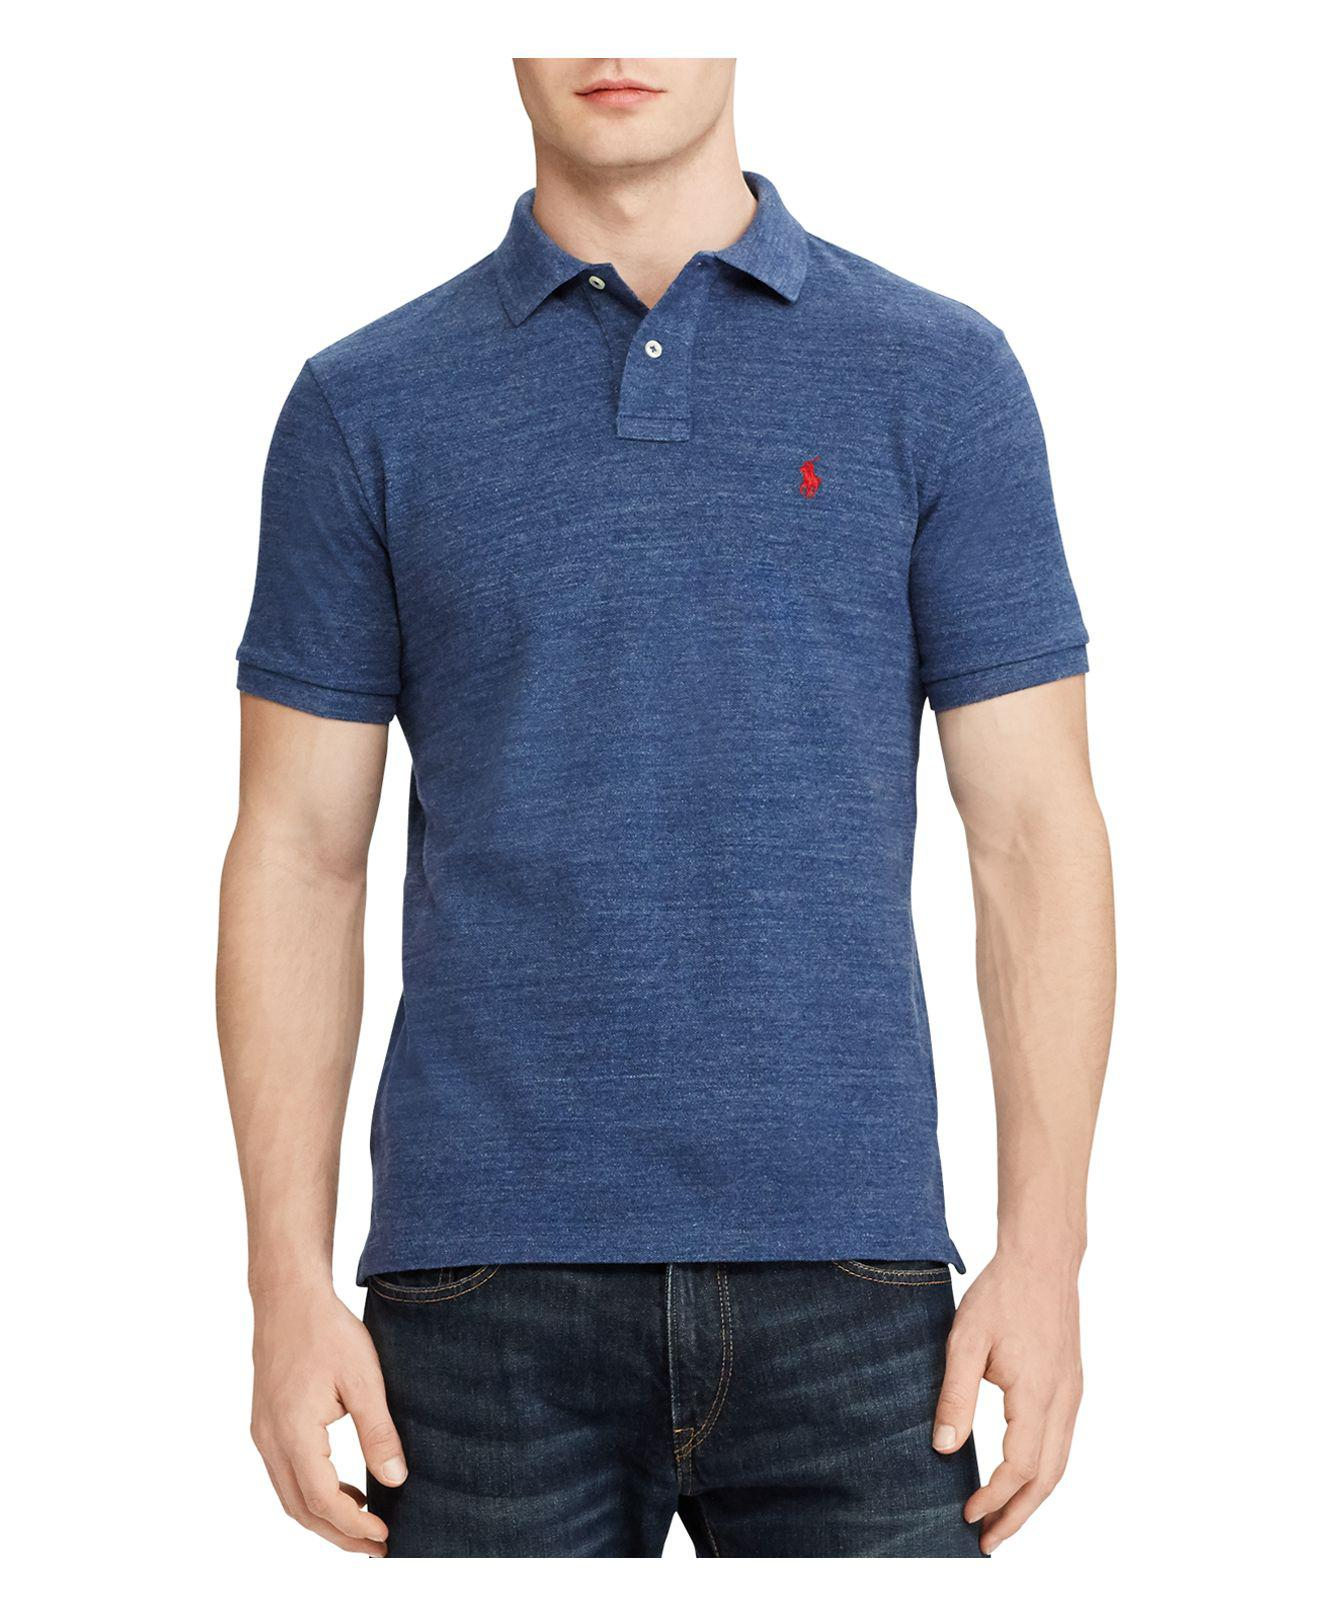 Polo Ralph Lauren. Men's Blue Cotton Mesh Custom Slim Fit Polo Shirt